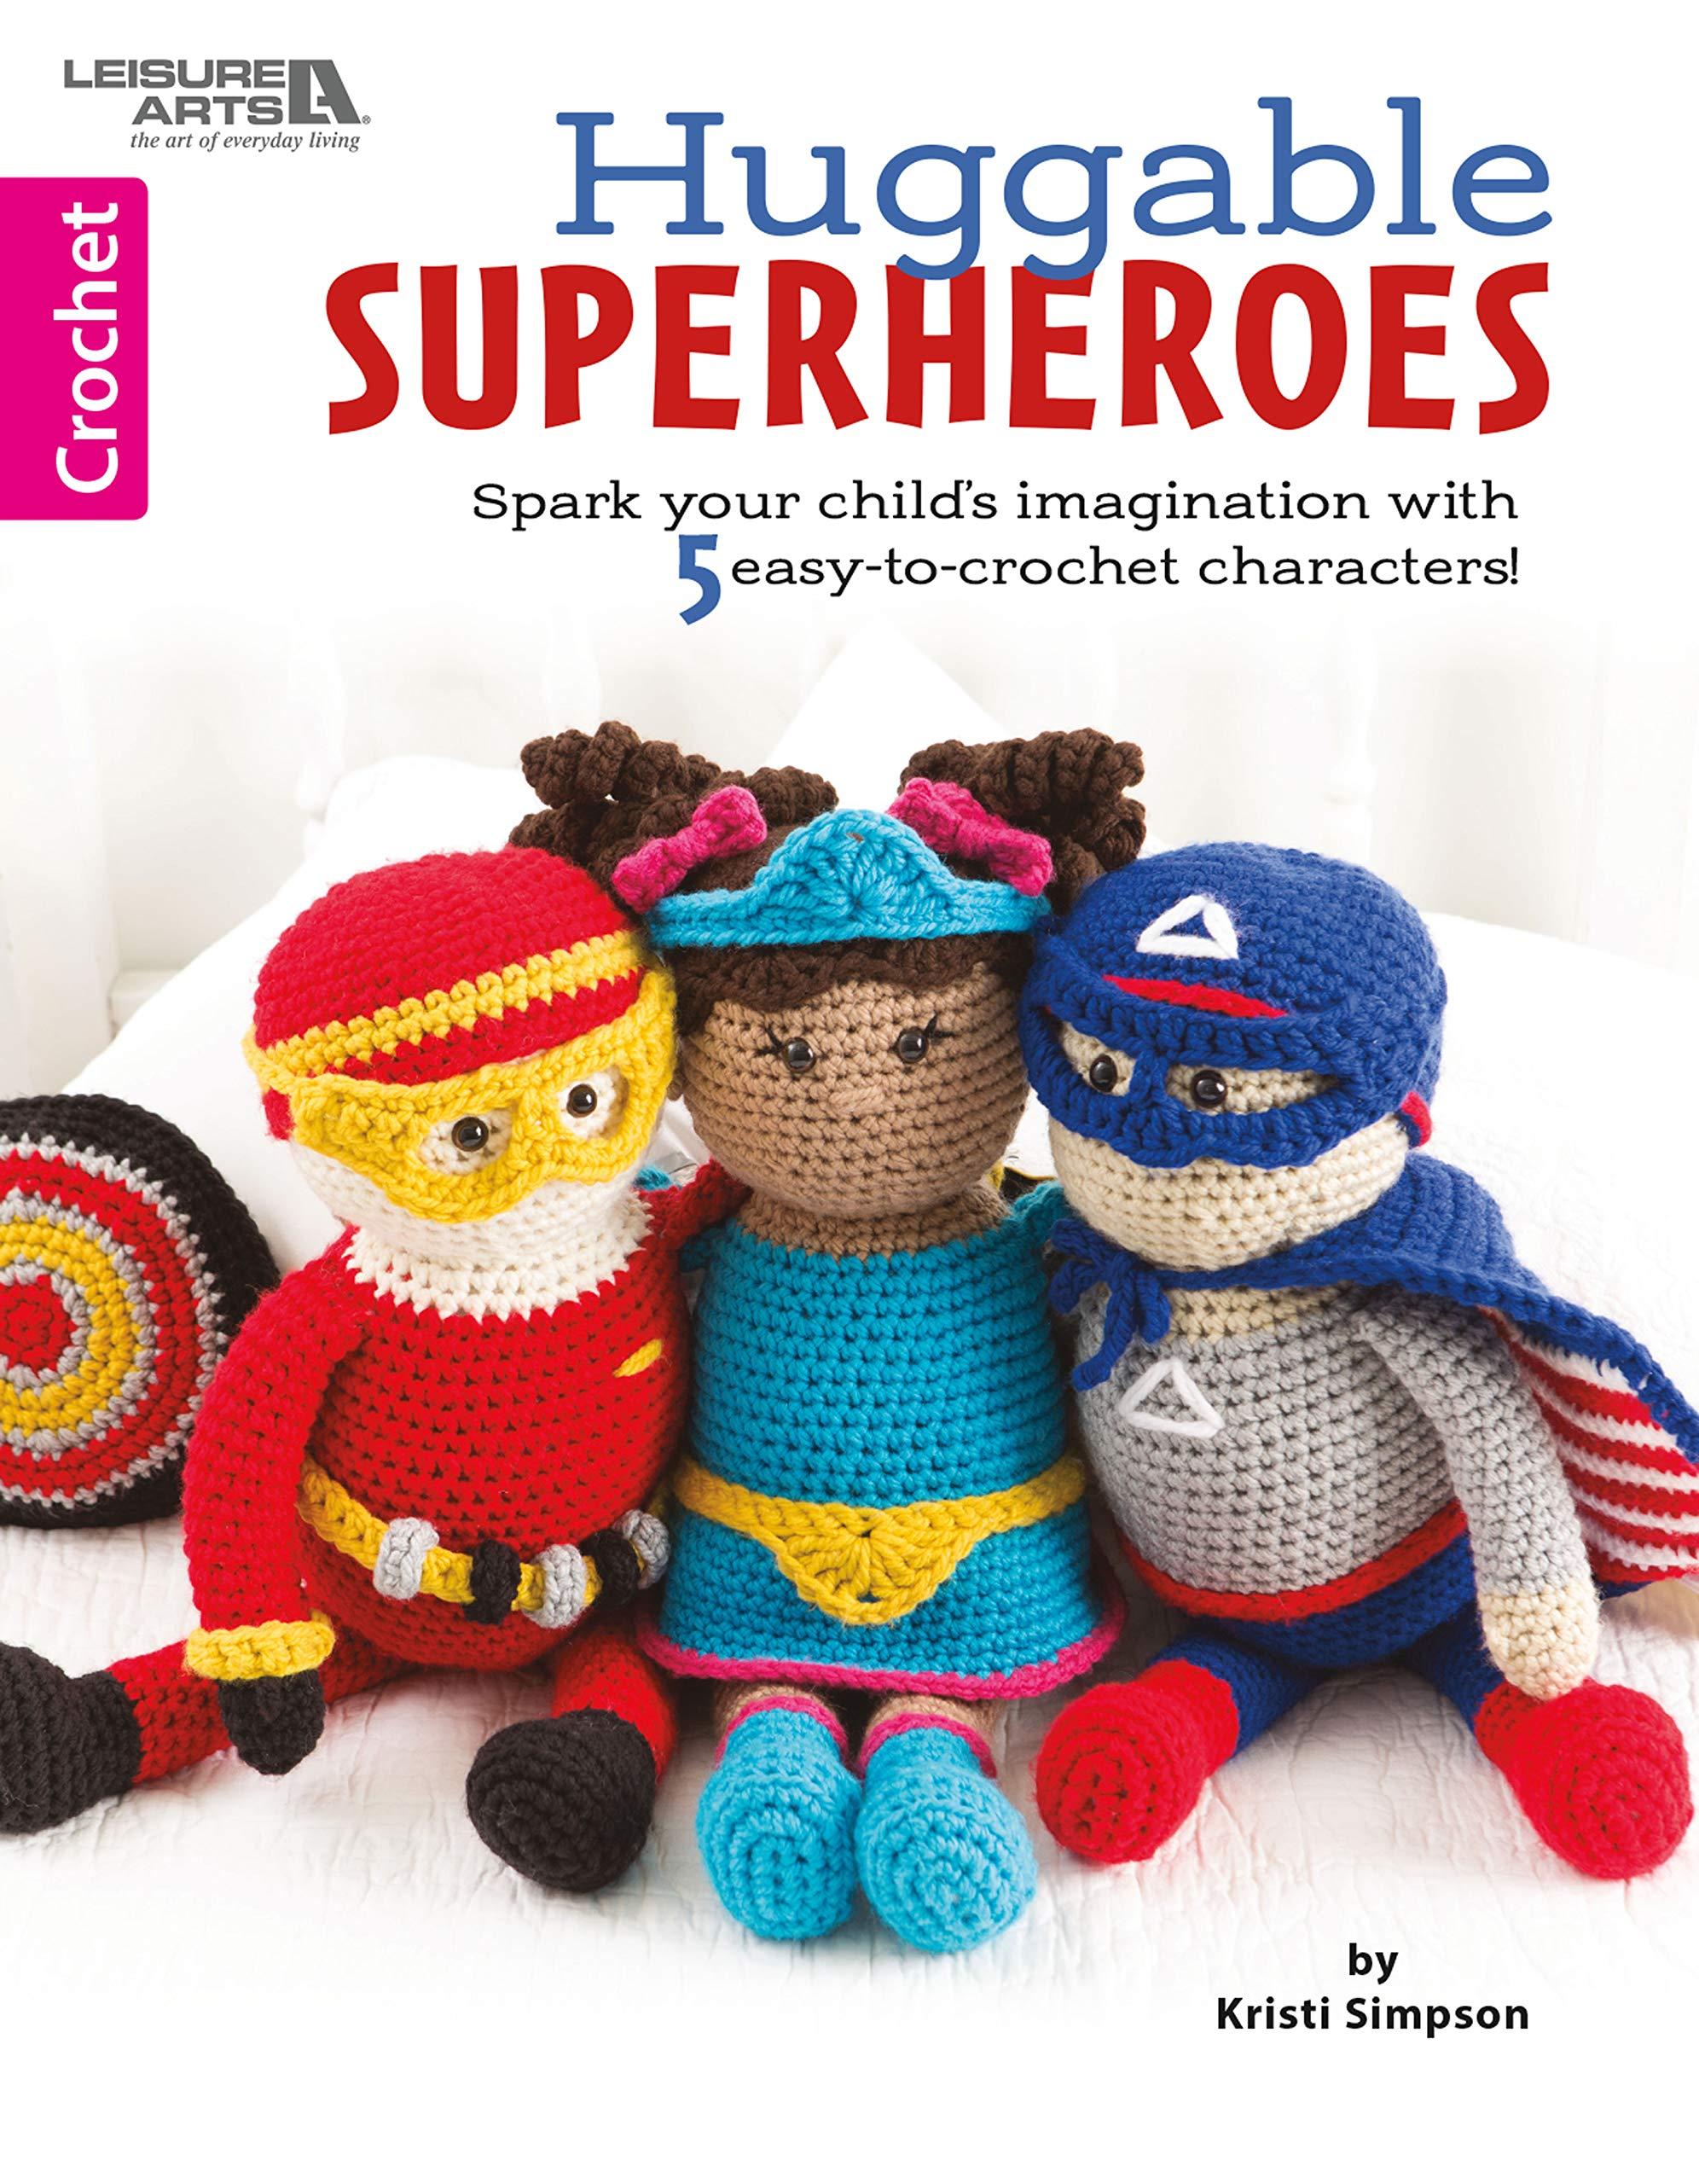 Huggable Superheroes Imagination Crochet Characters product image